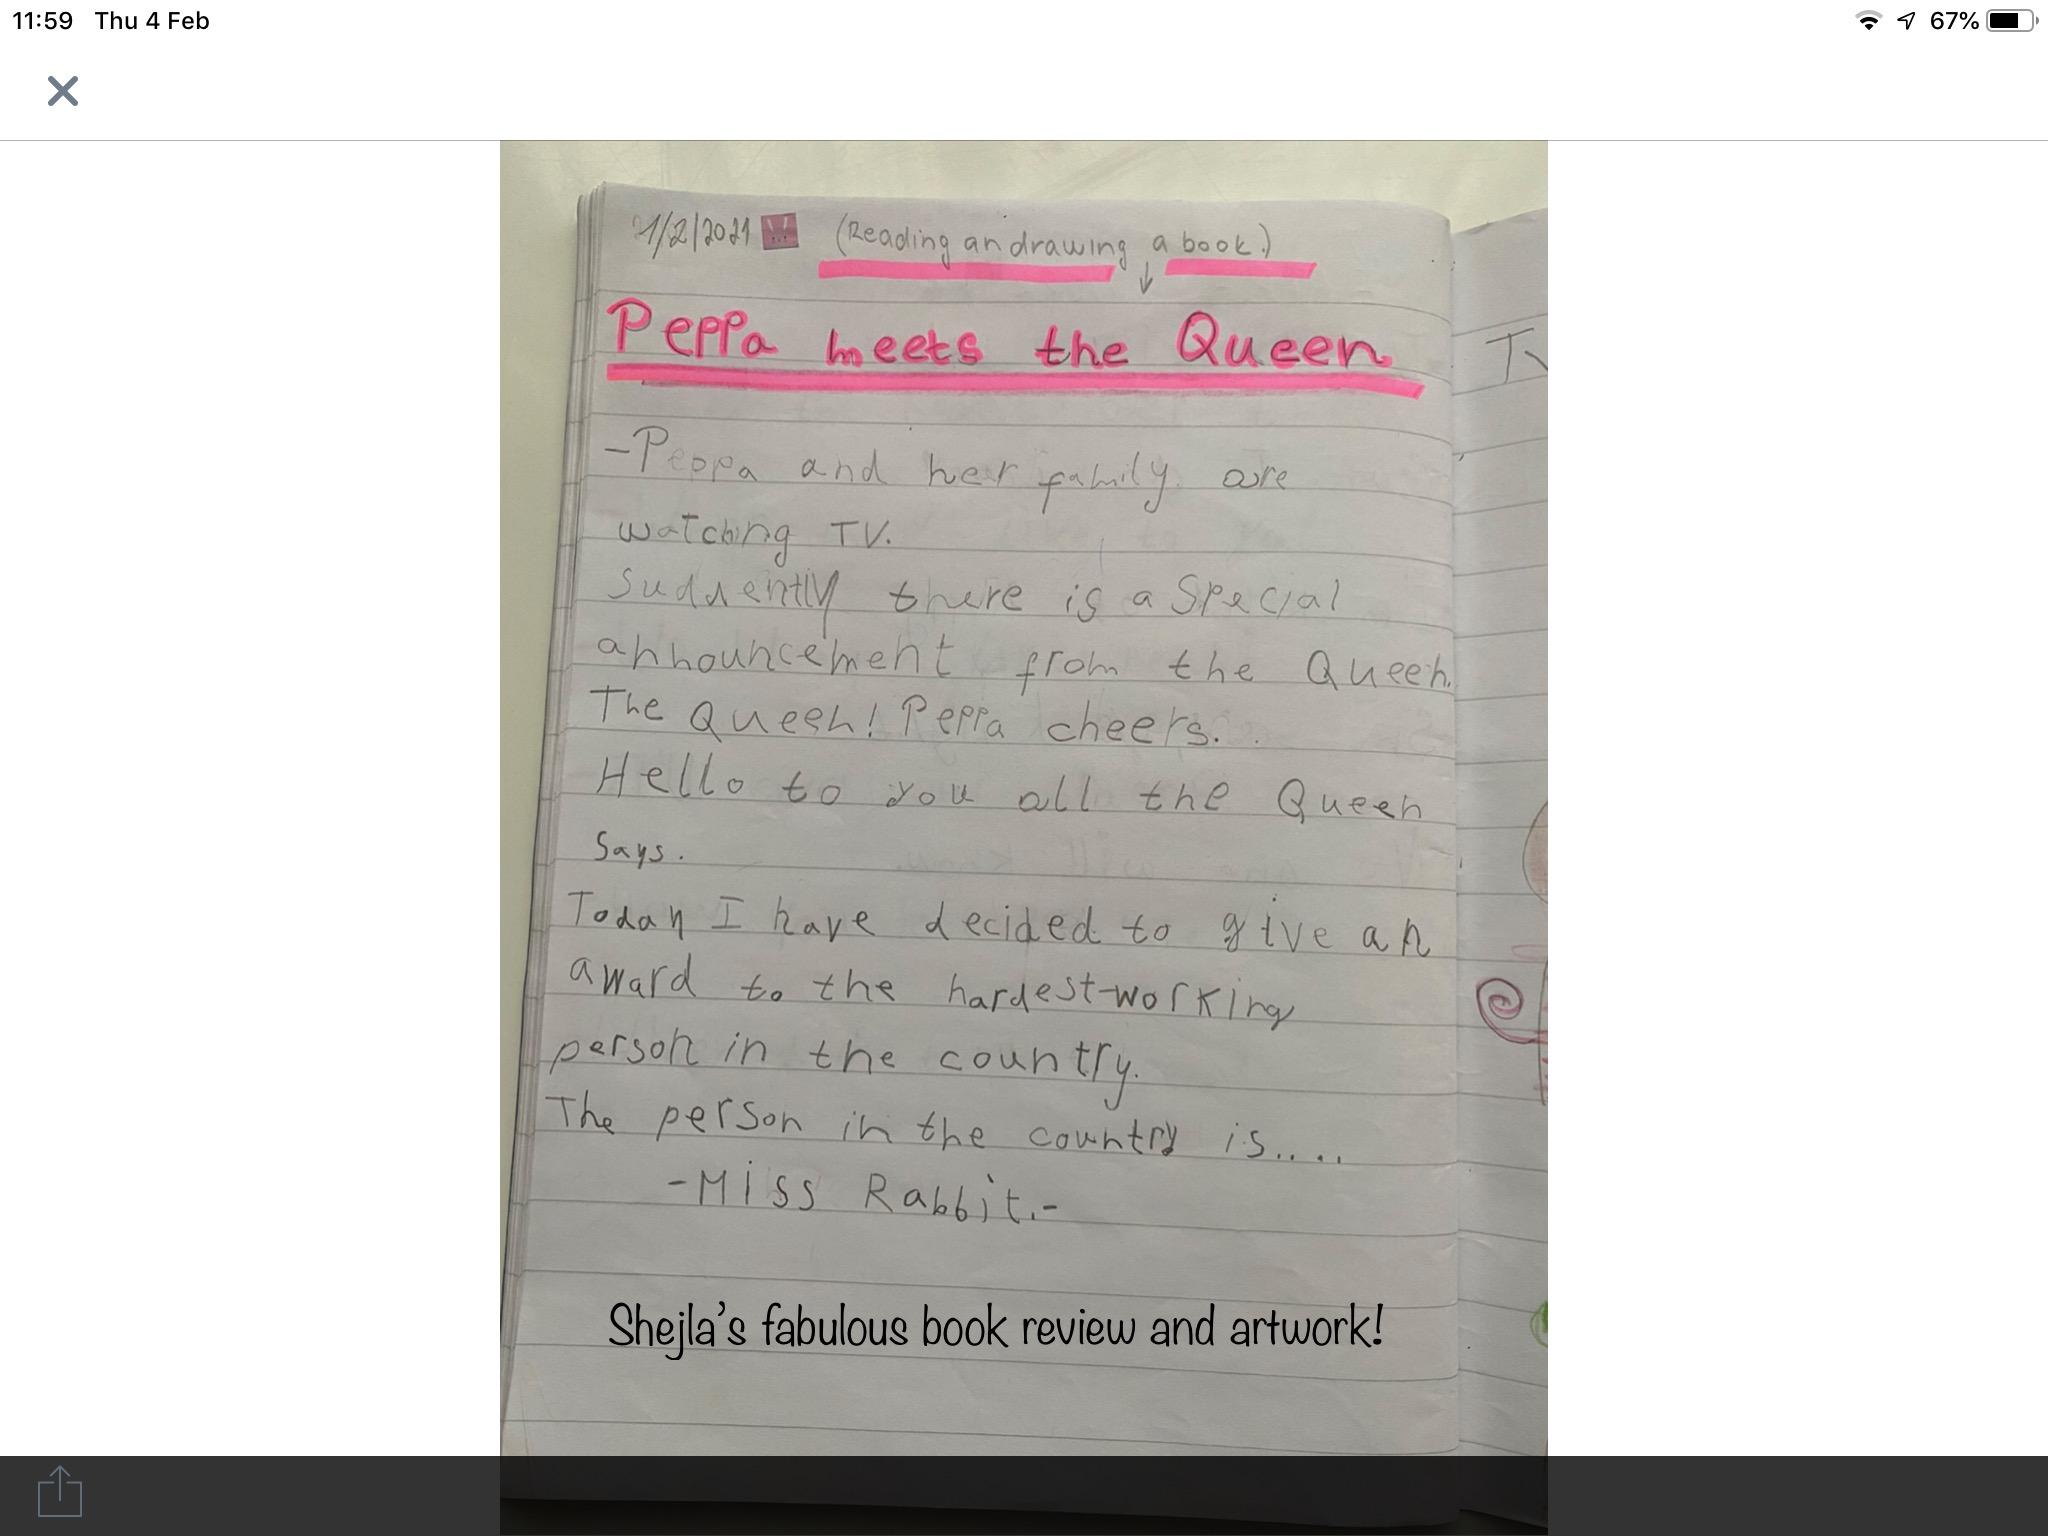 Shejla's incredible writing!